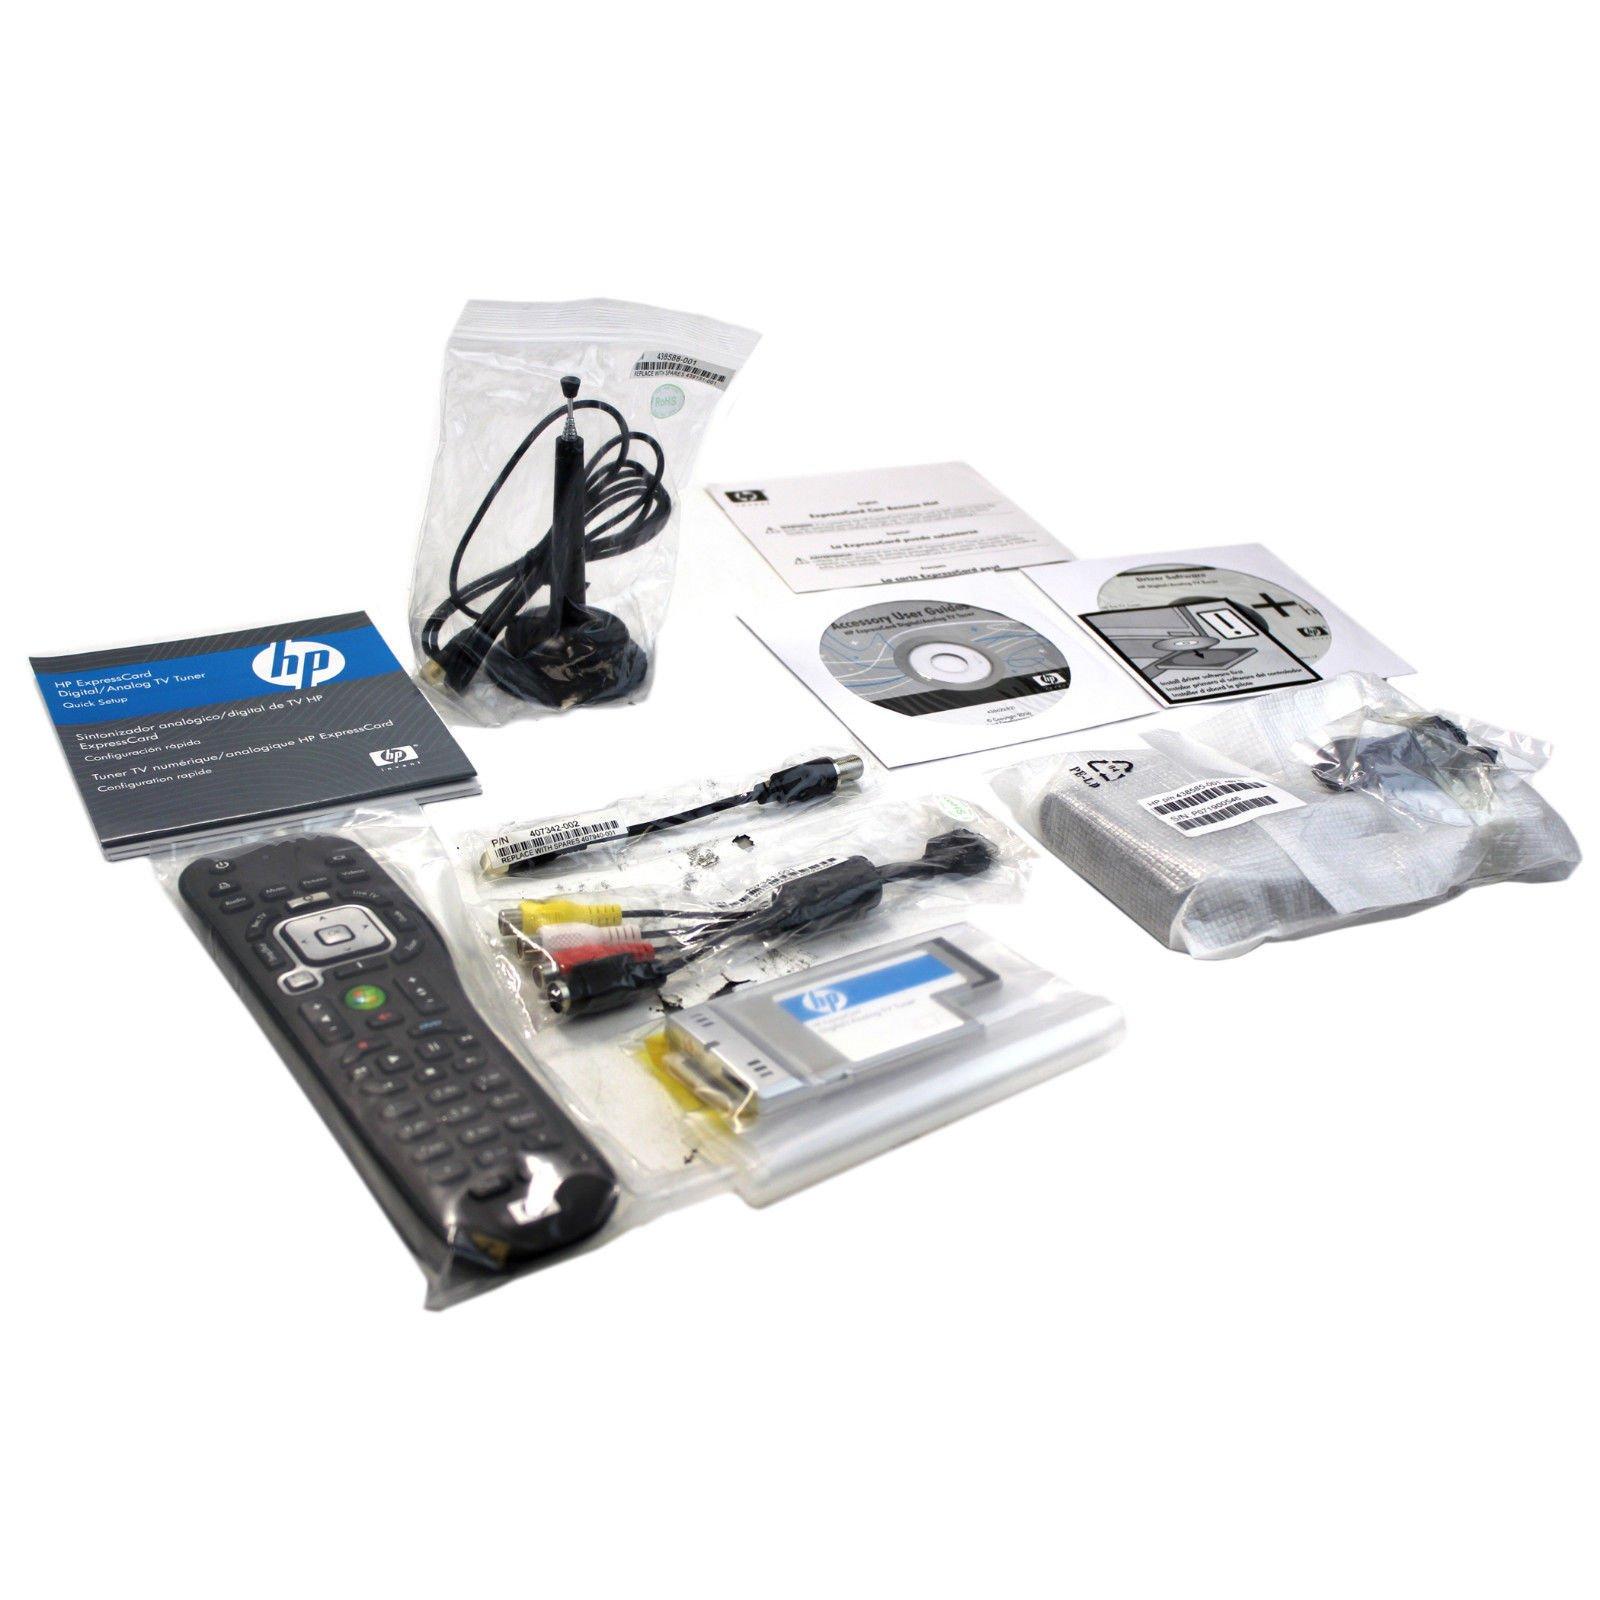 HP EXPRESSCARD DIGITAL ANALOG TV TUNER DRIVERS FOR WINDOWS